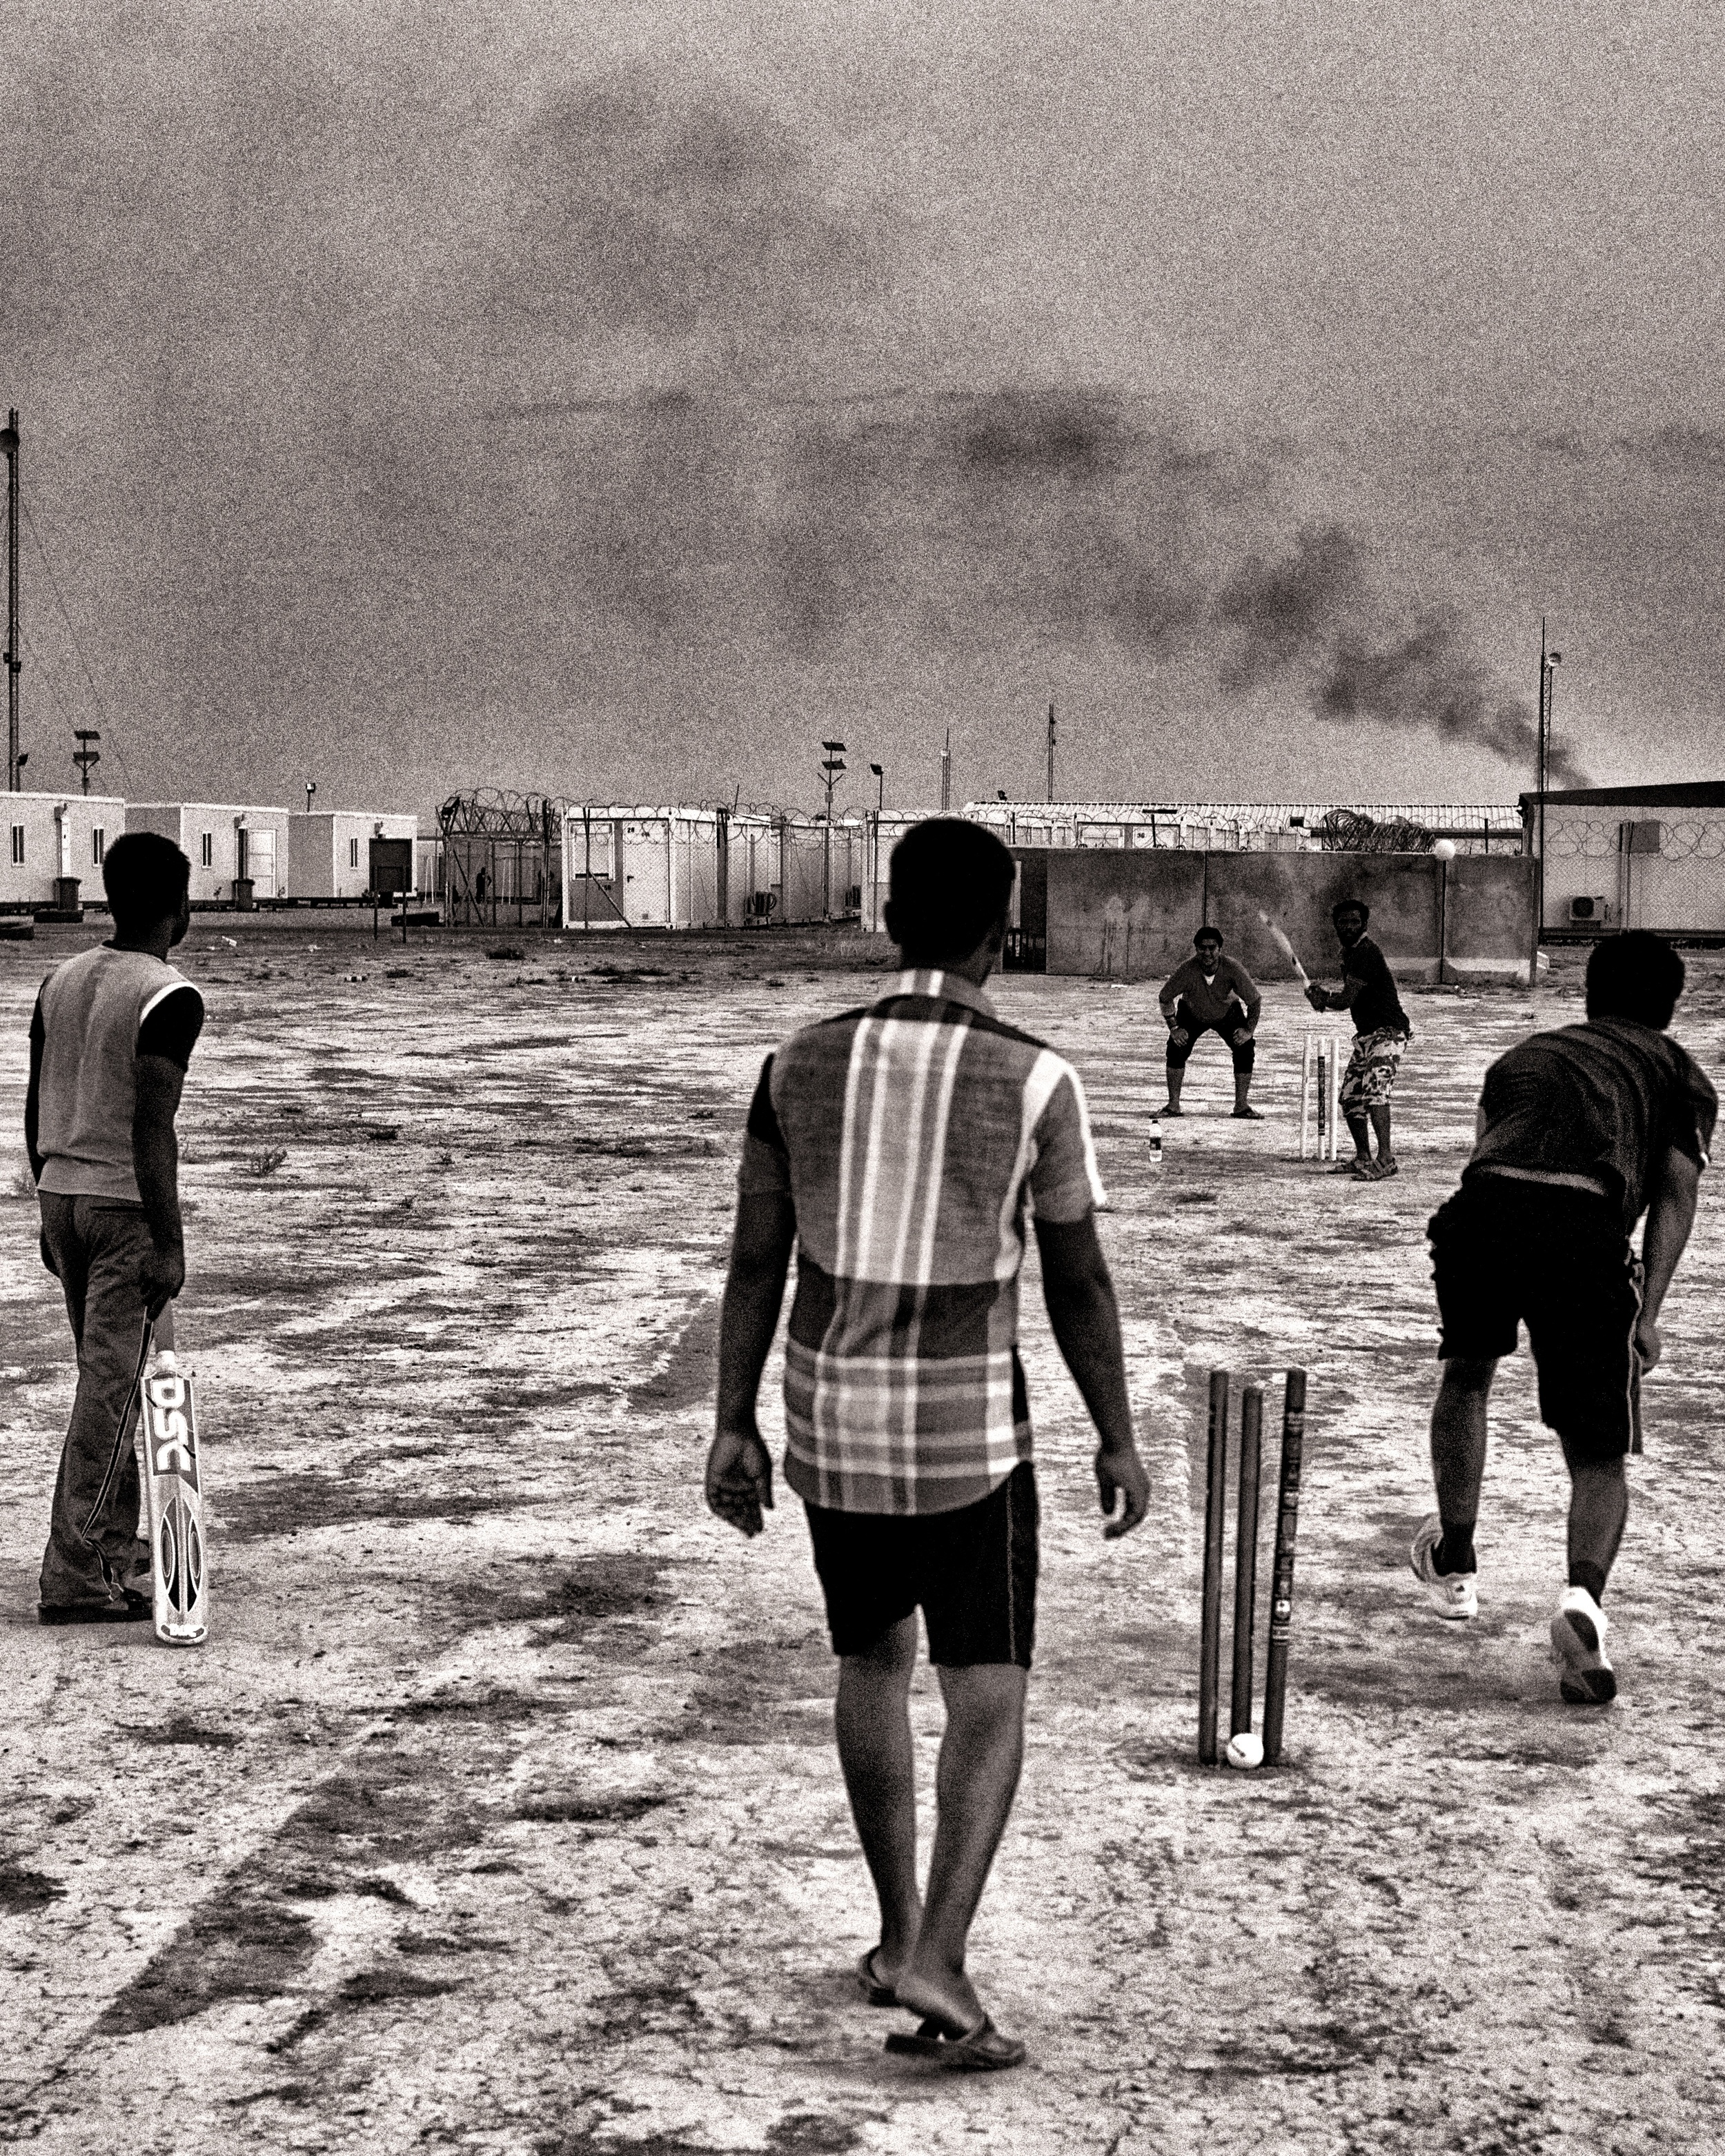 iraq badra work rest play 11.jpg